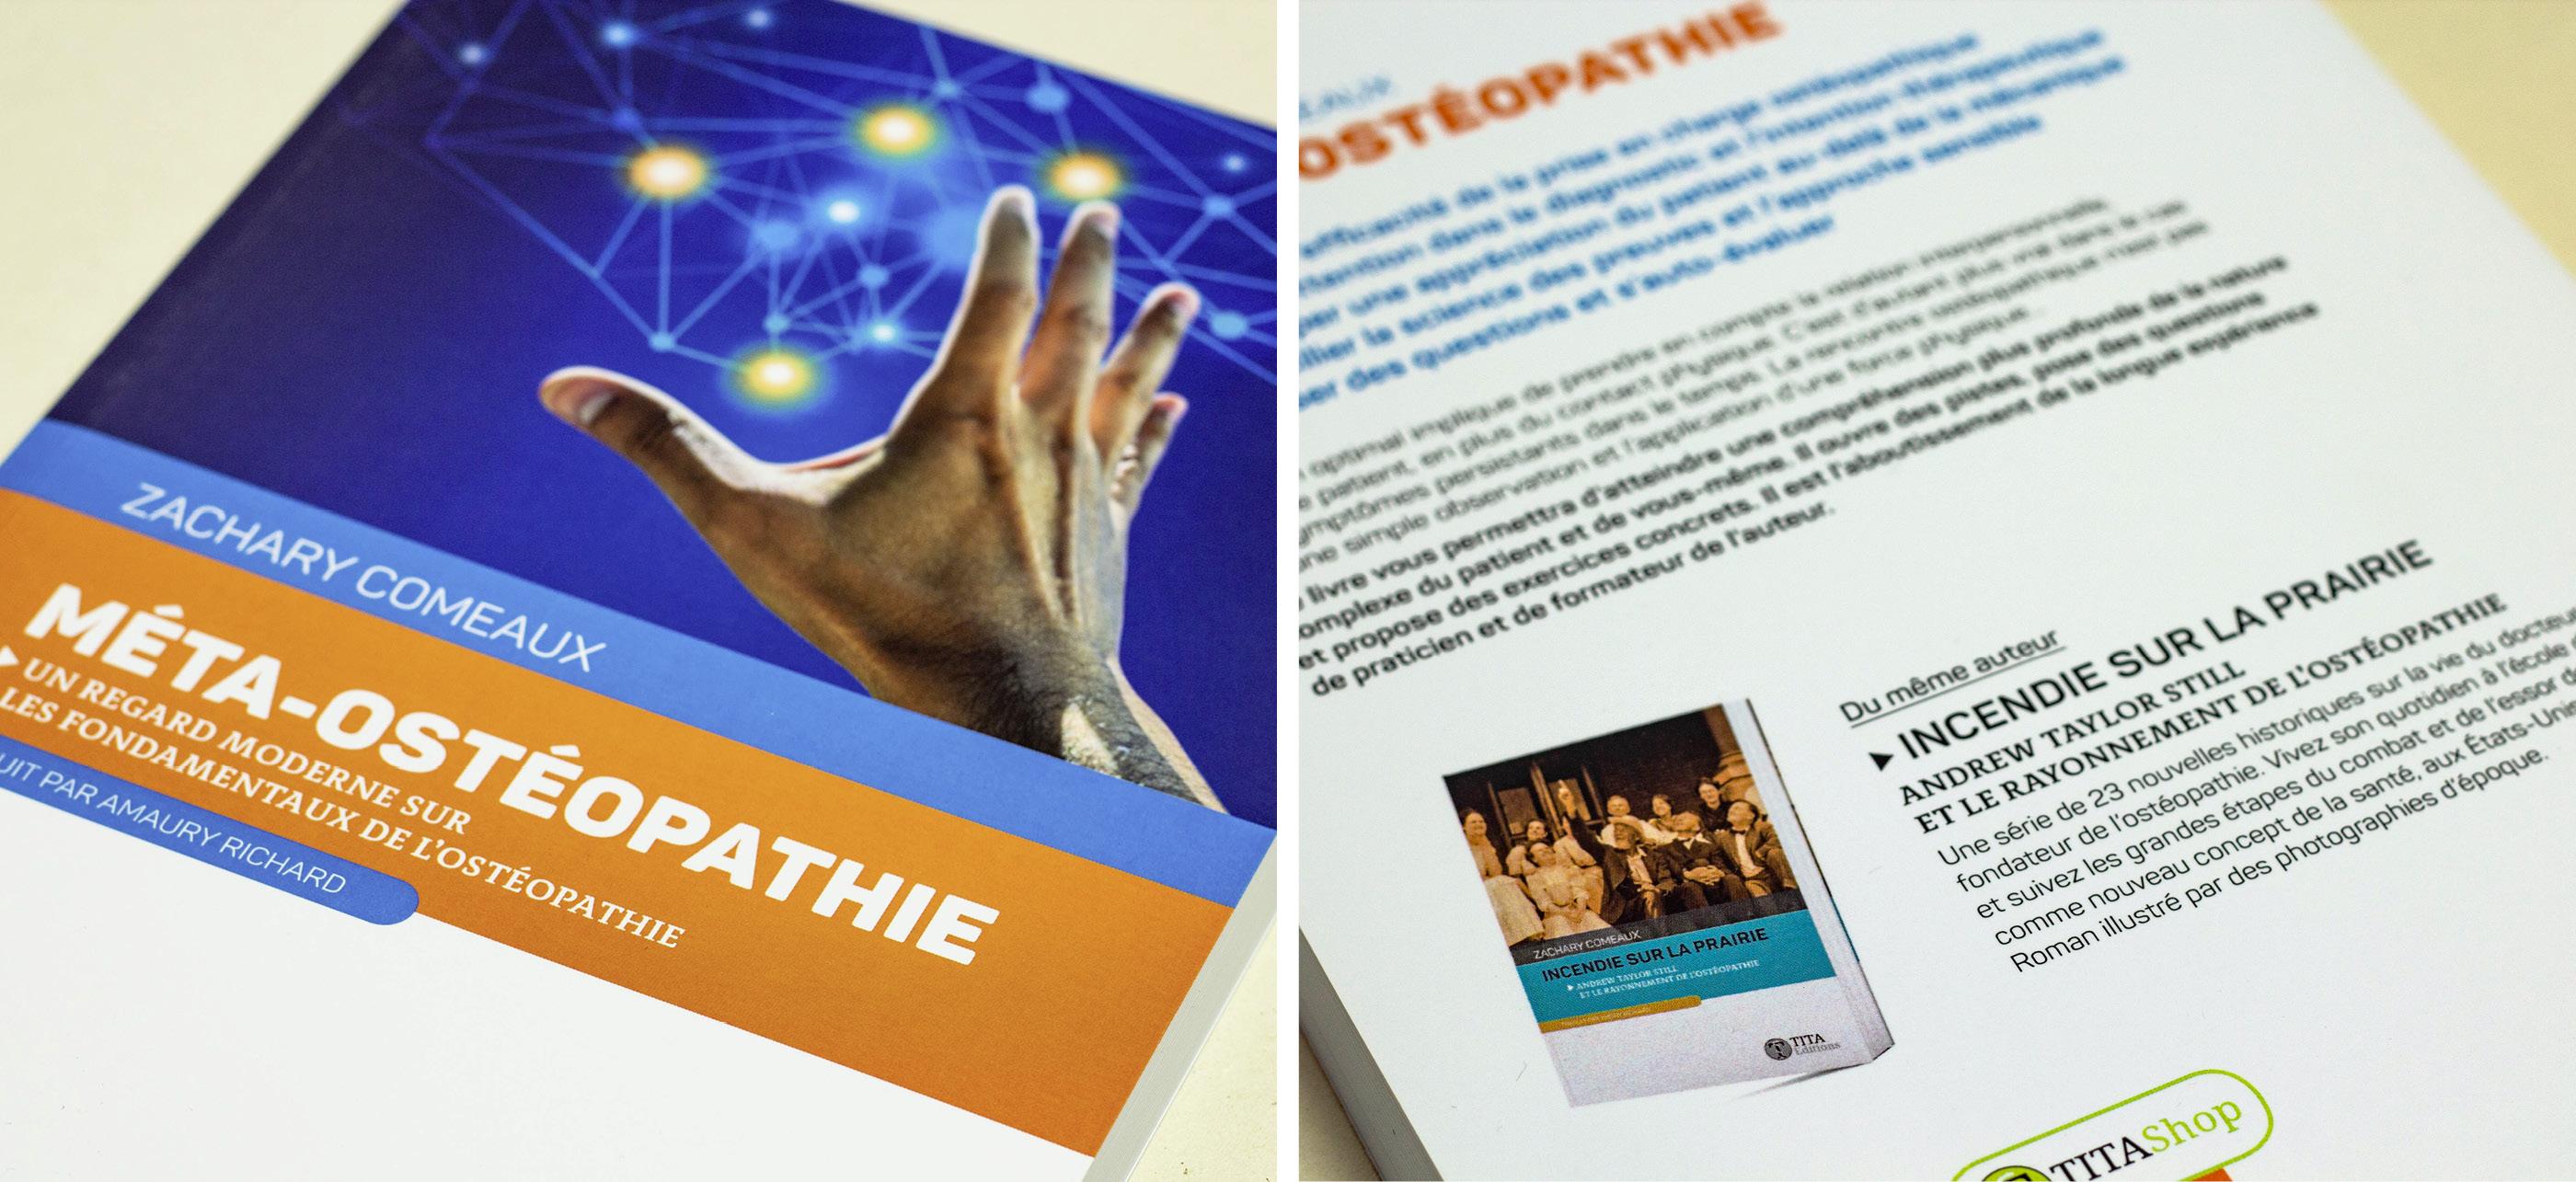 Méta-ostéopathie Tita Éditions